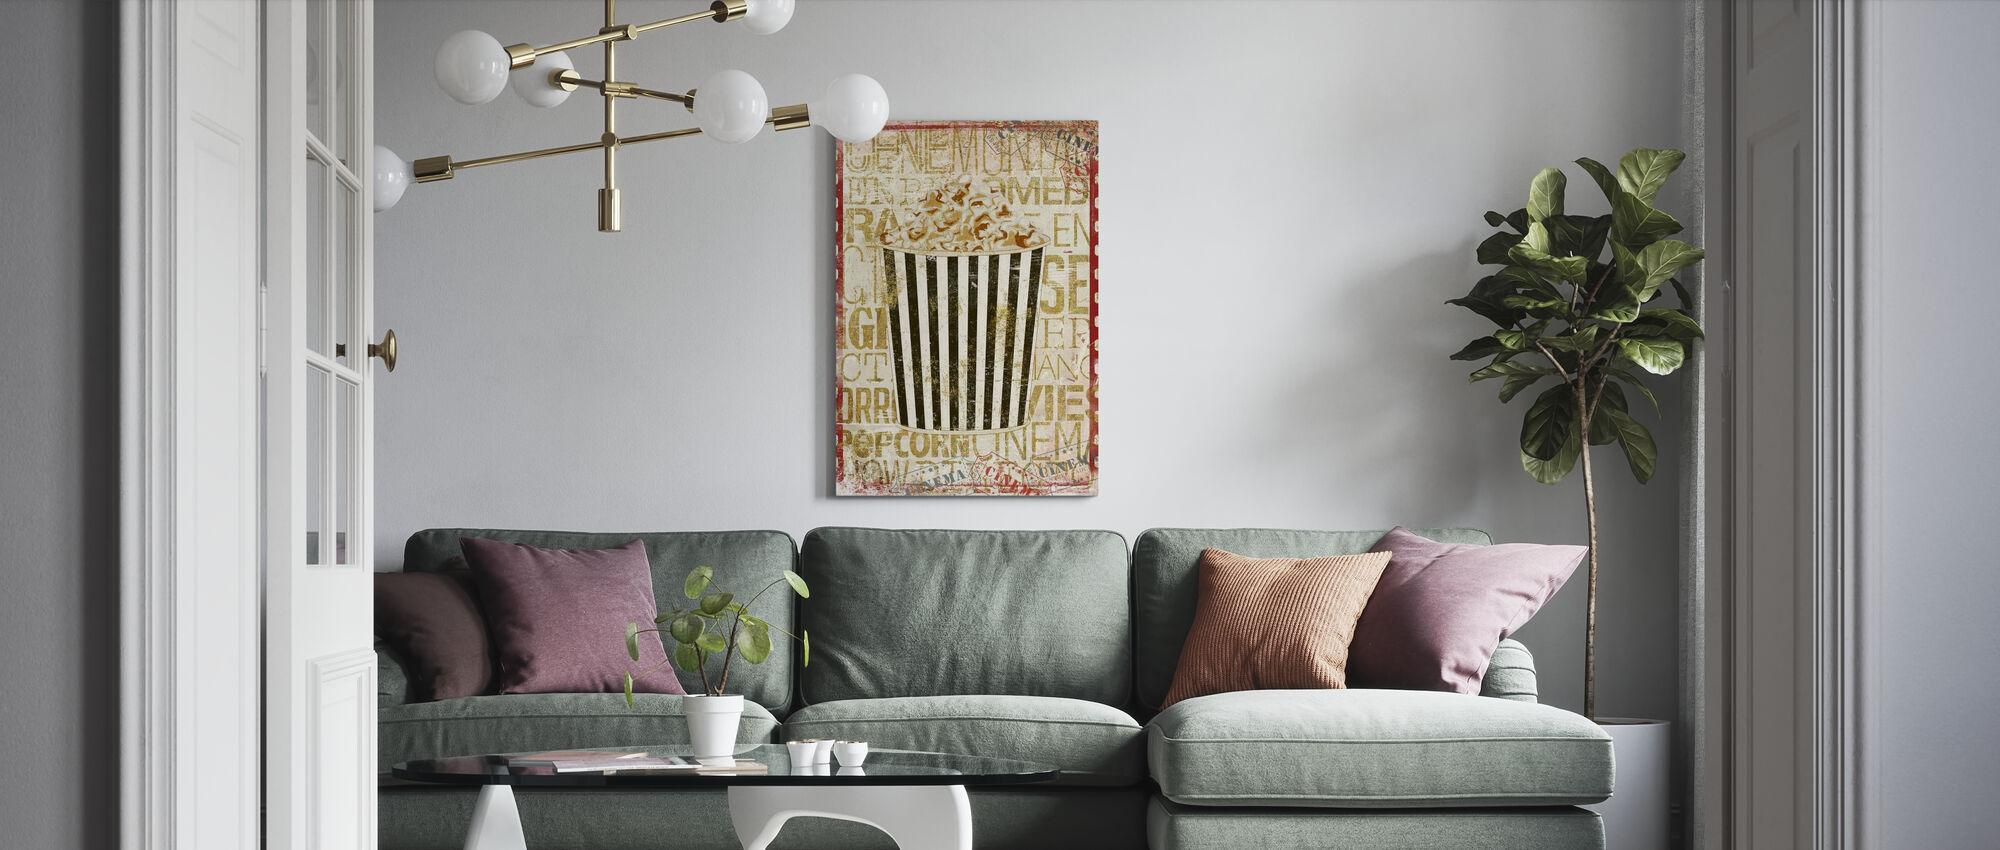 Cinema Popcorn - Canvas print - Living Room